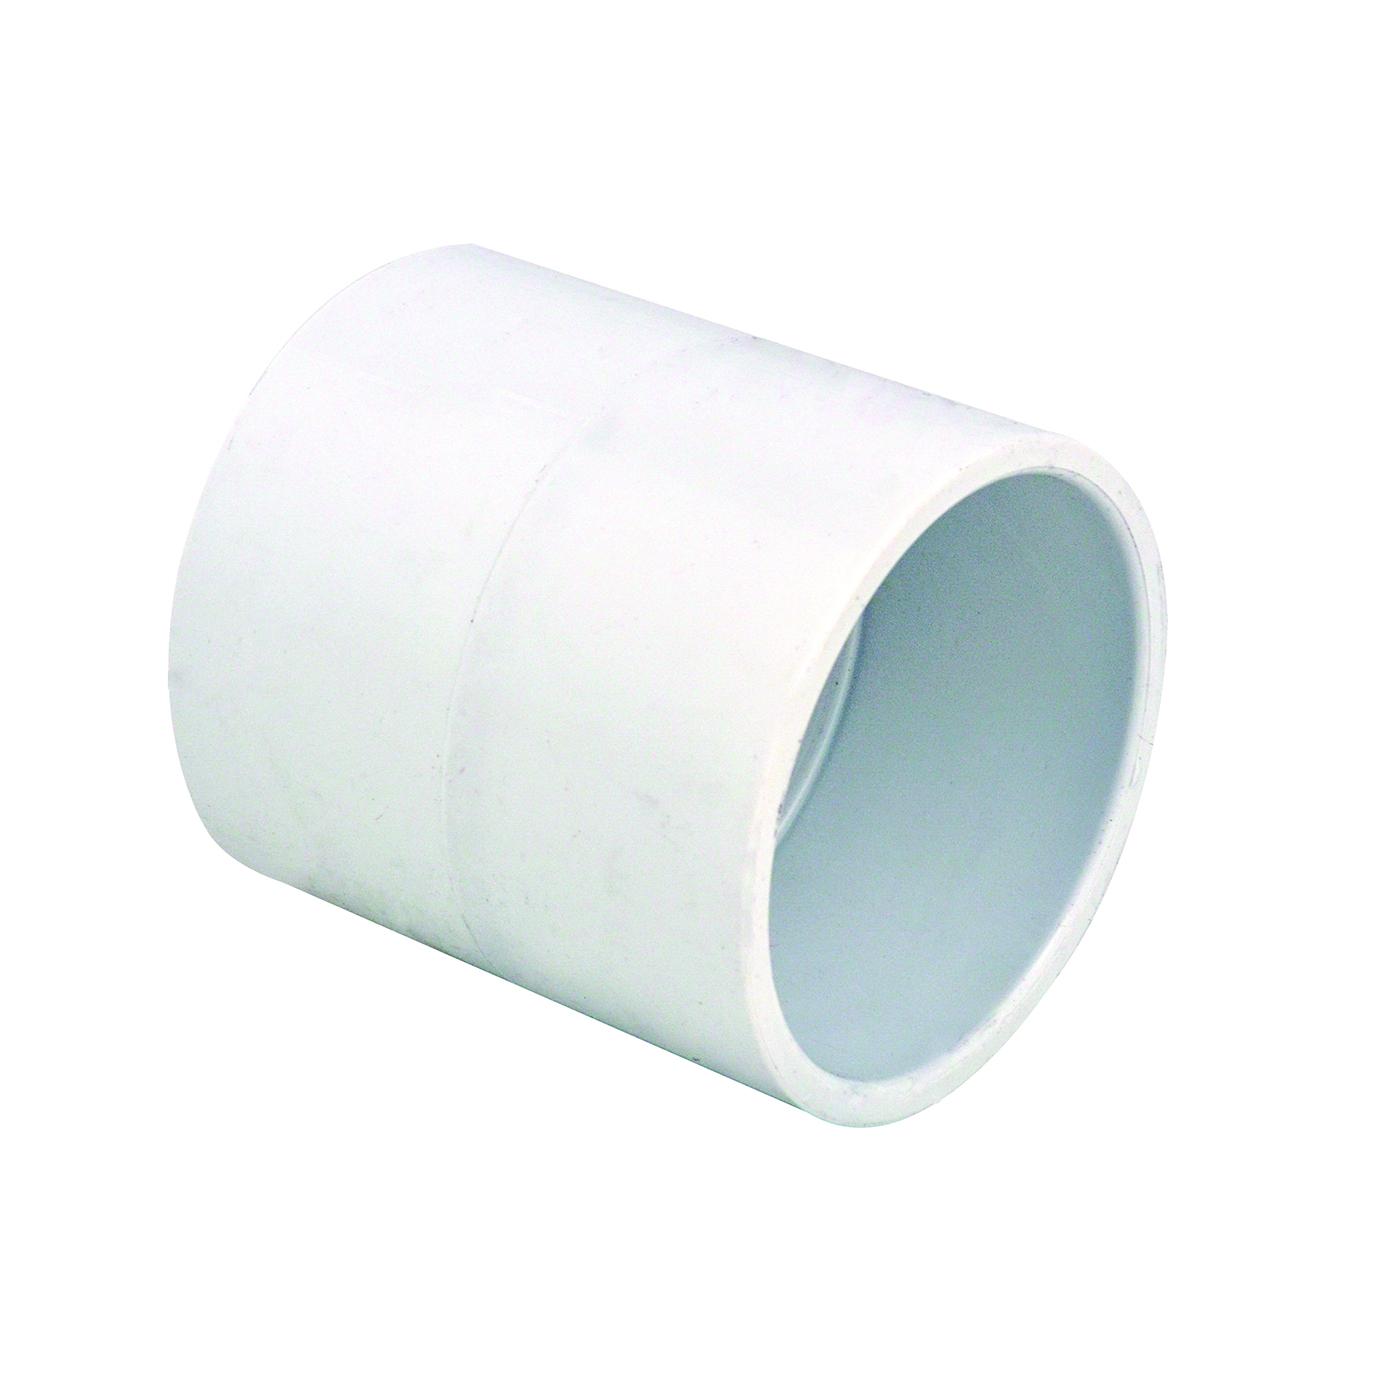 "3/4"" Schedule 40 White PVC Socket Coupling"